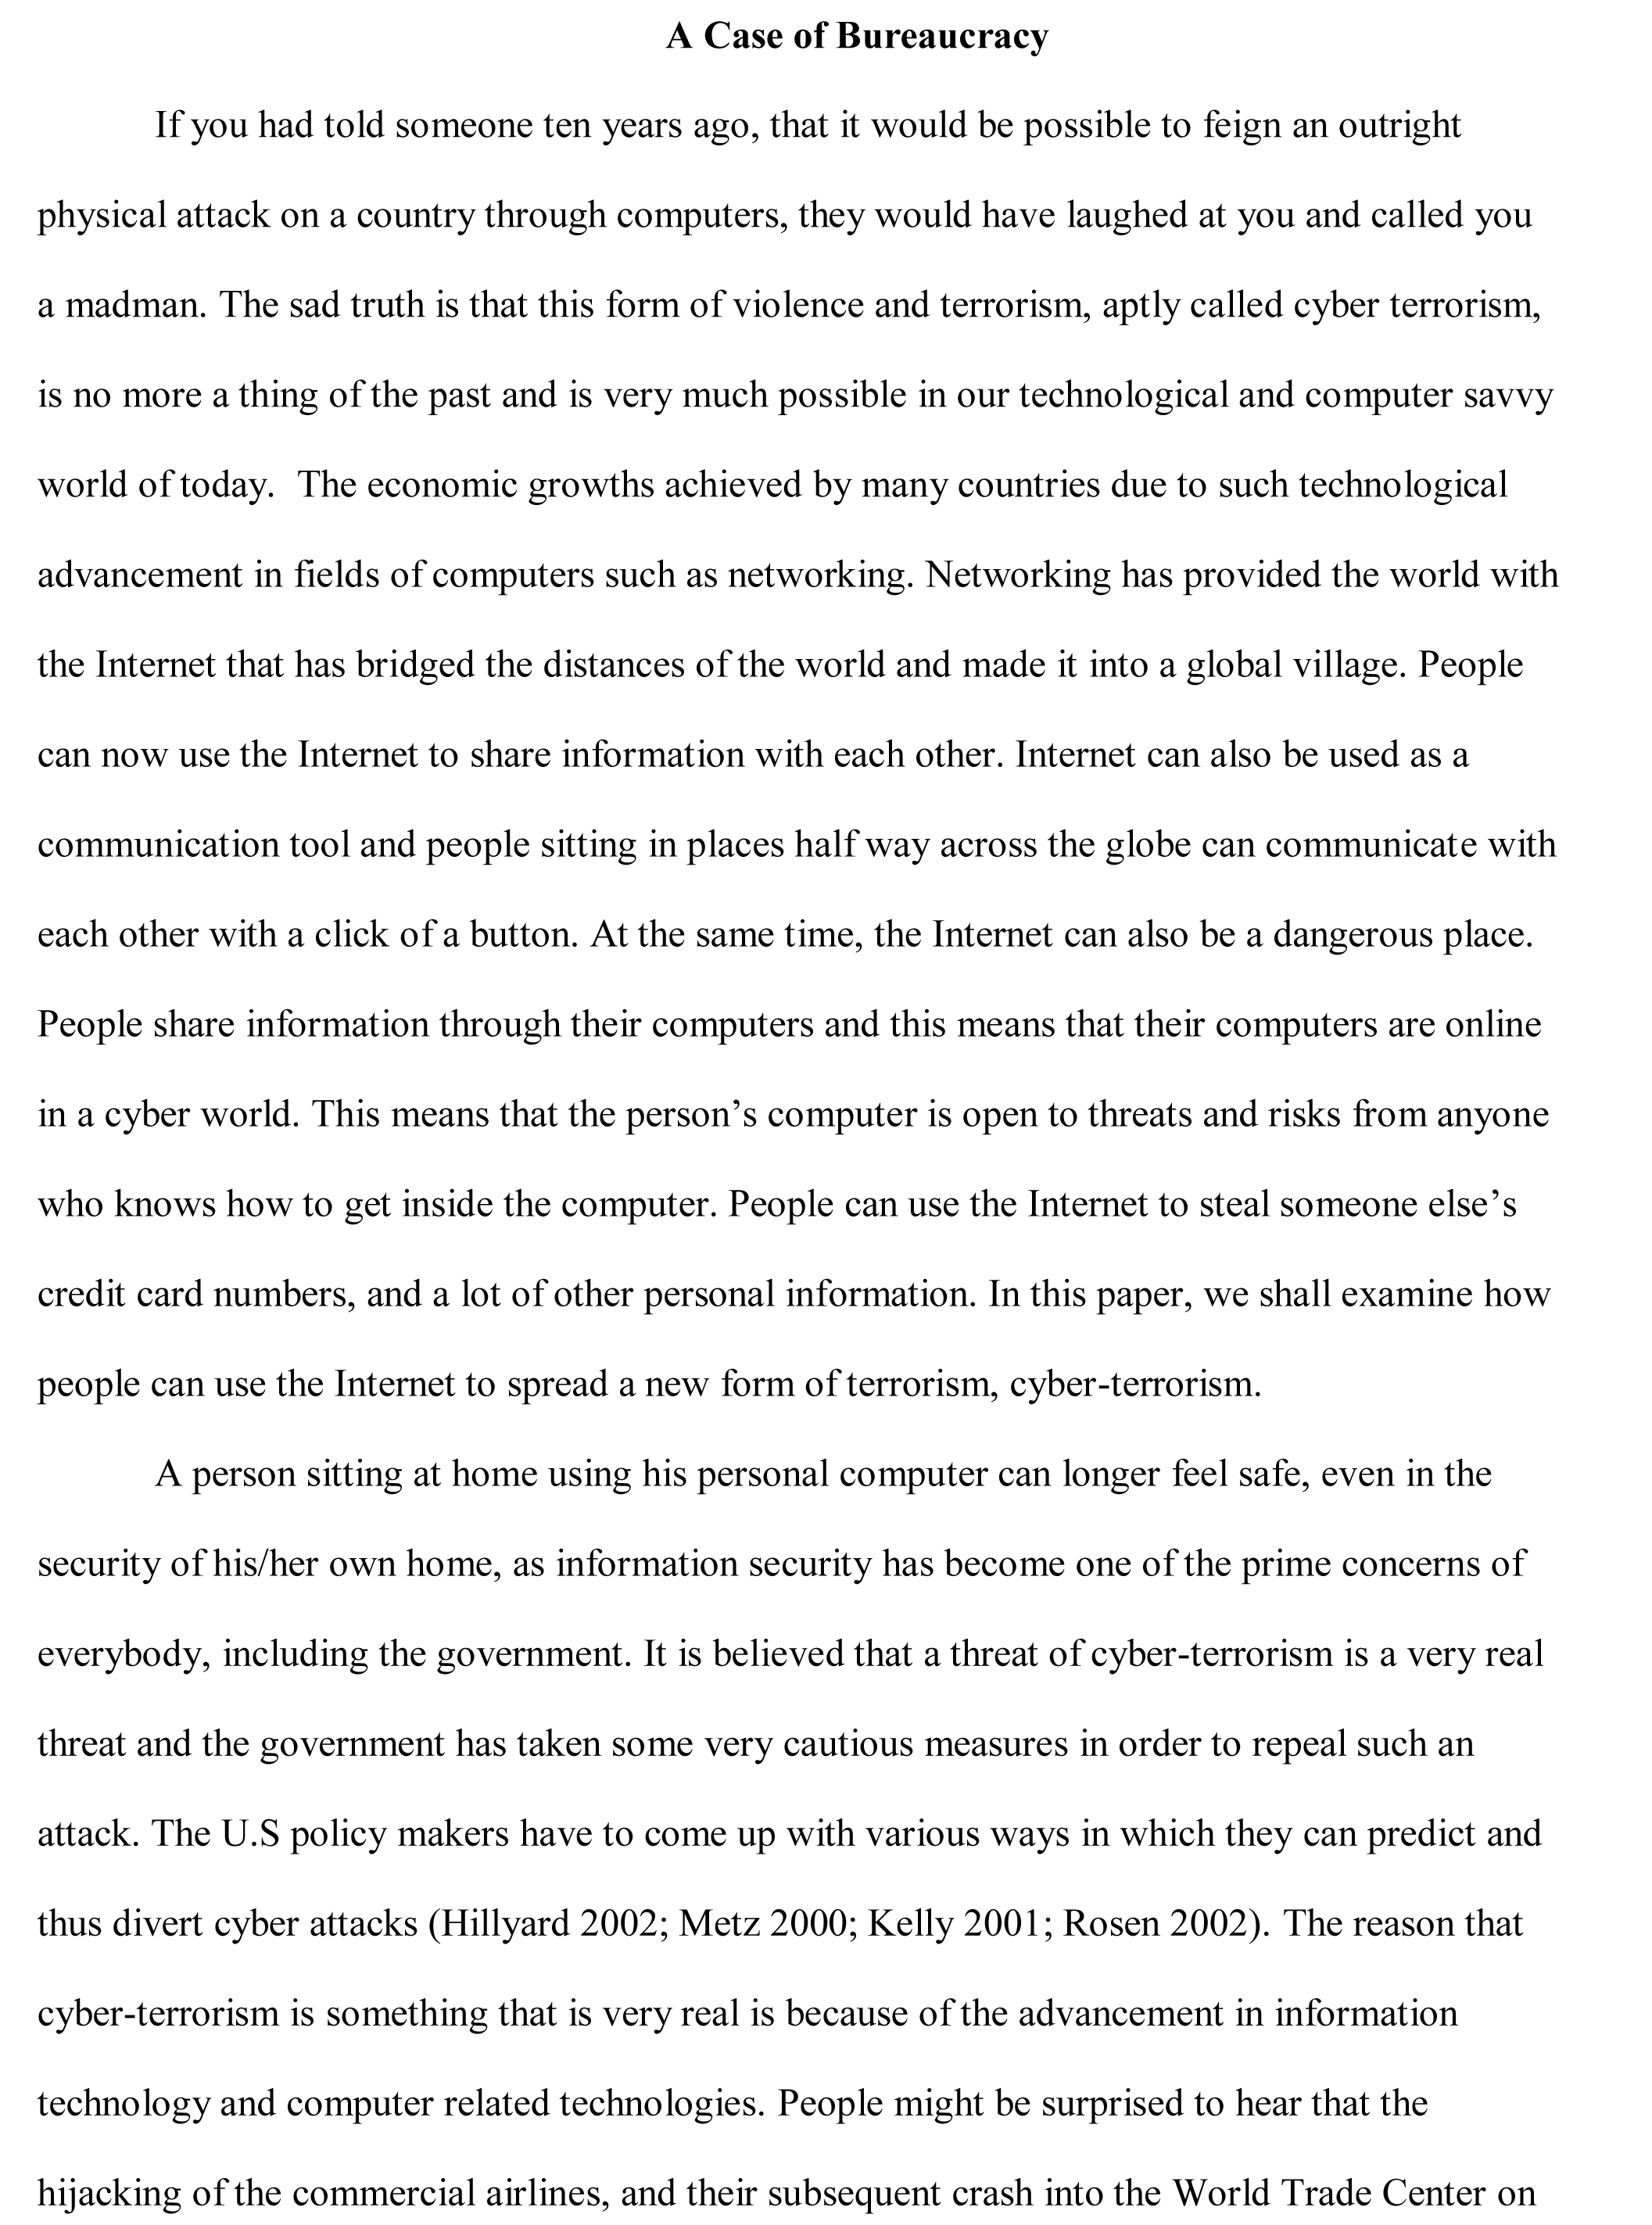 012 Essay Example Lemon Clot Unusual Reddit Full